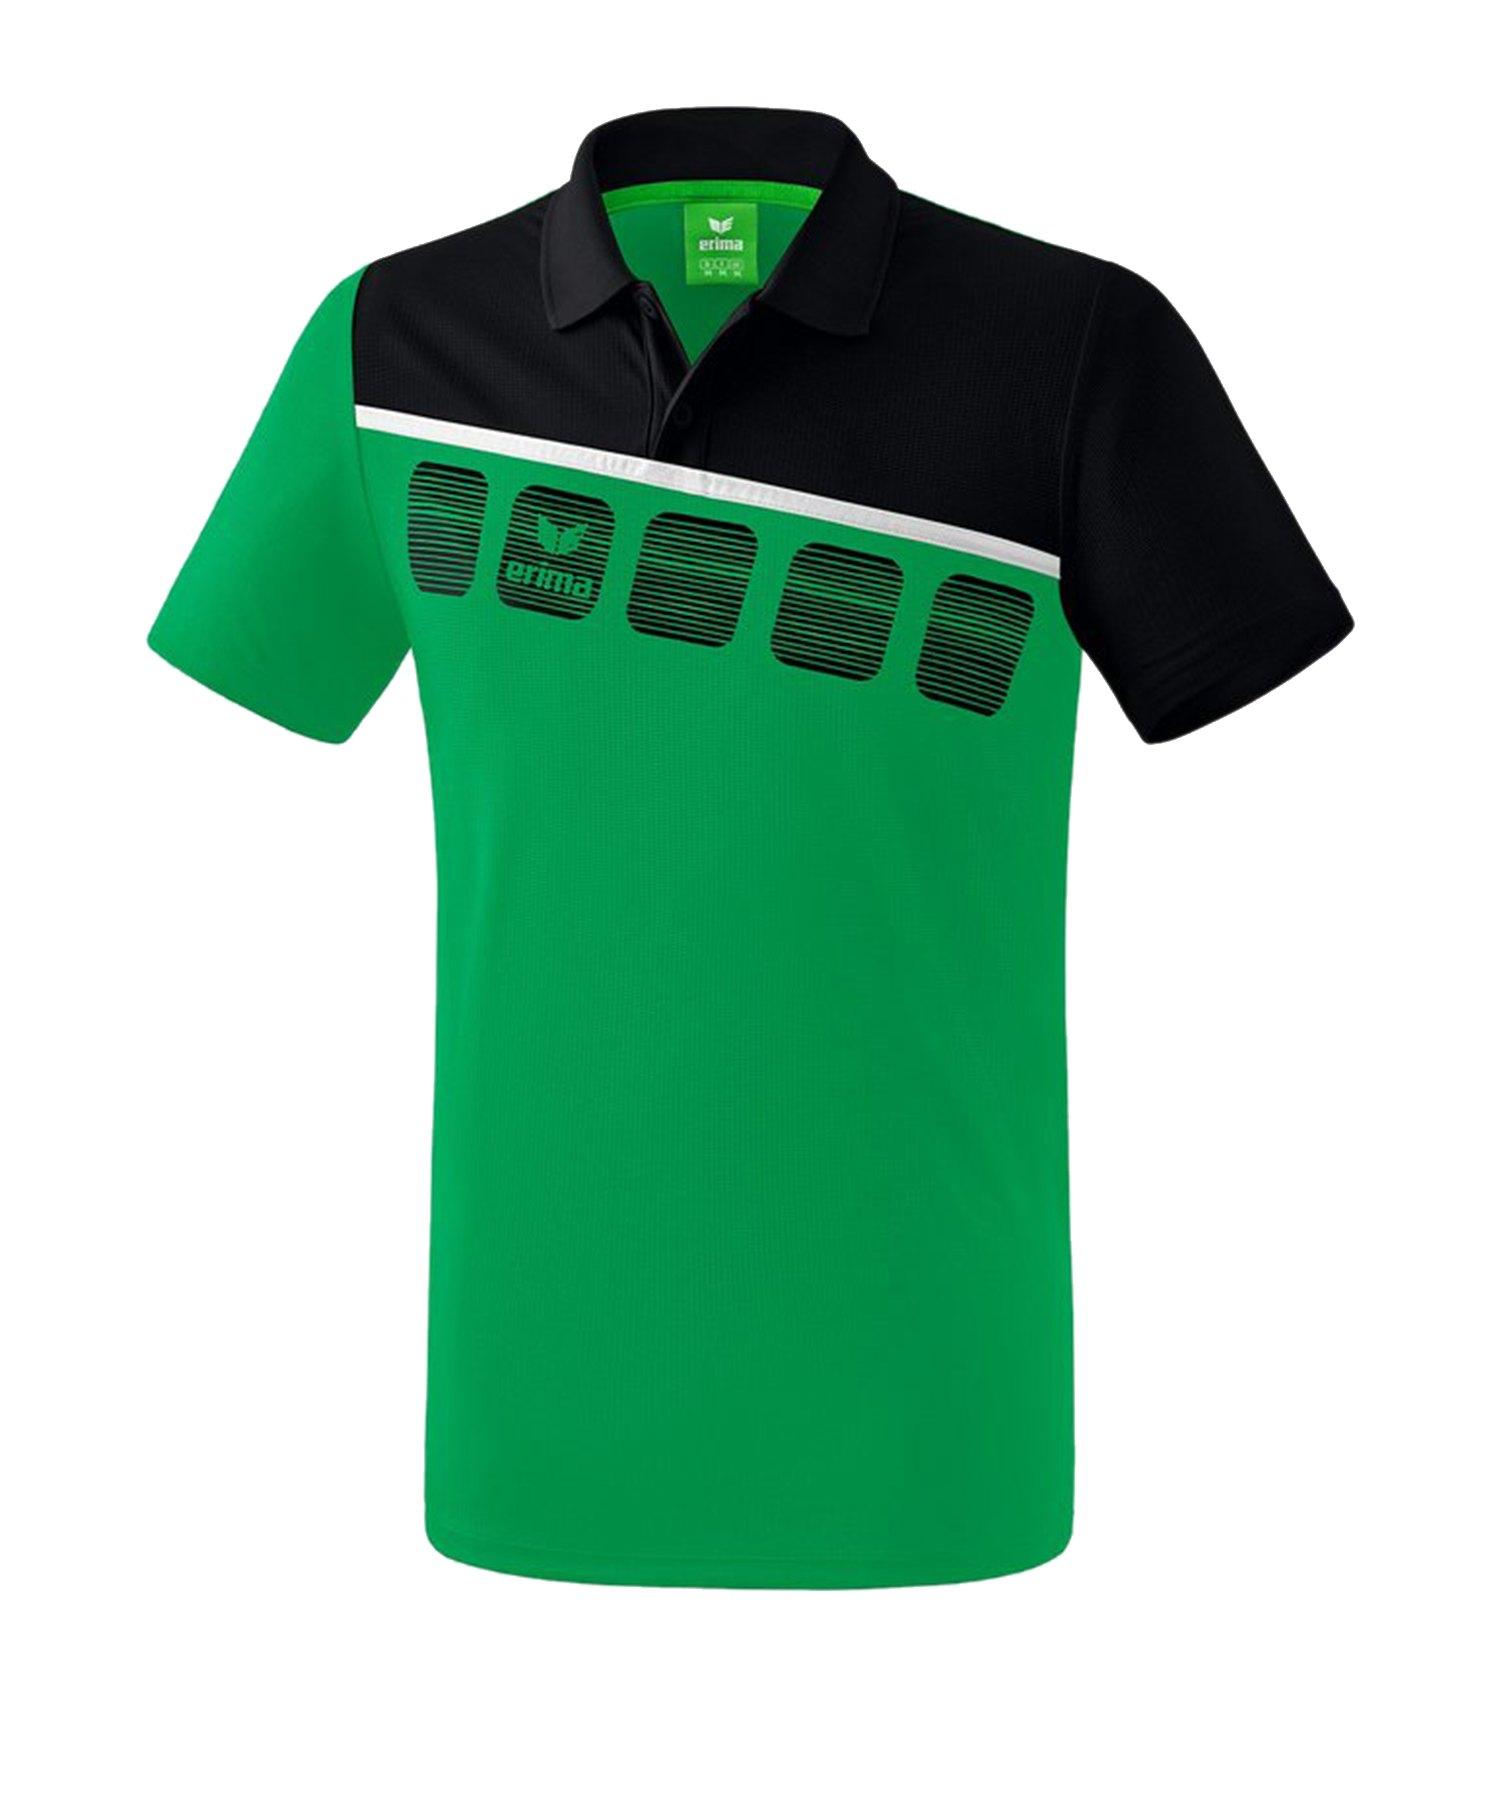 Erima 5-C Poloshirt Grün Schwarz - Gruen